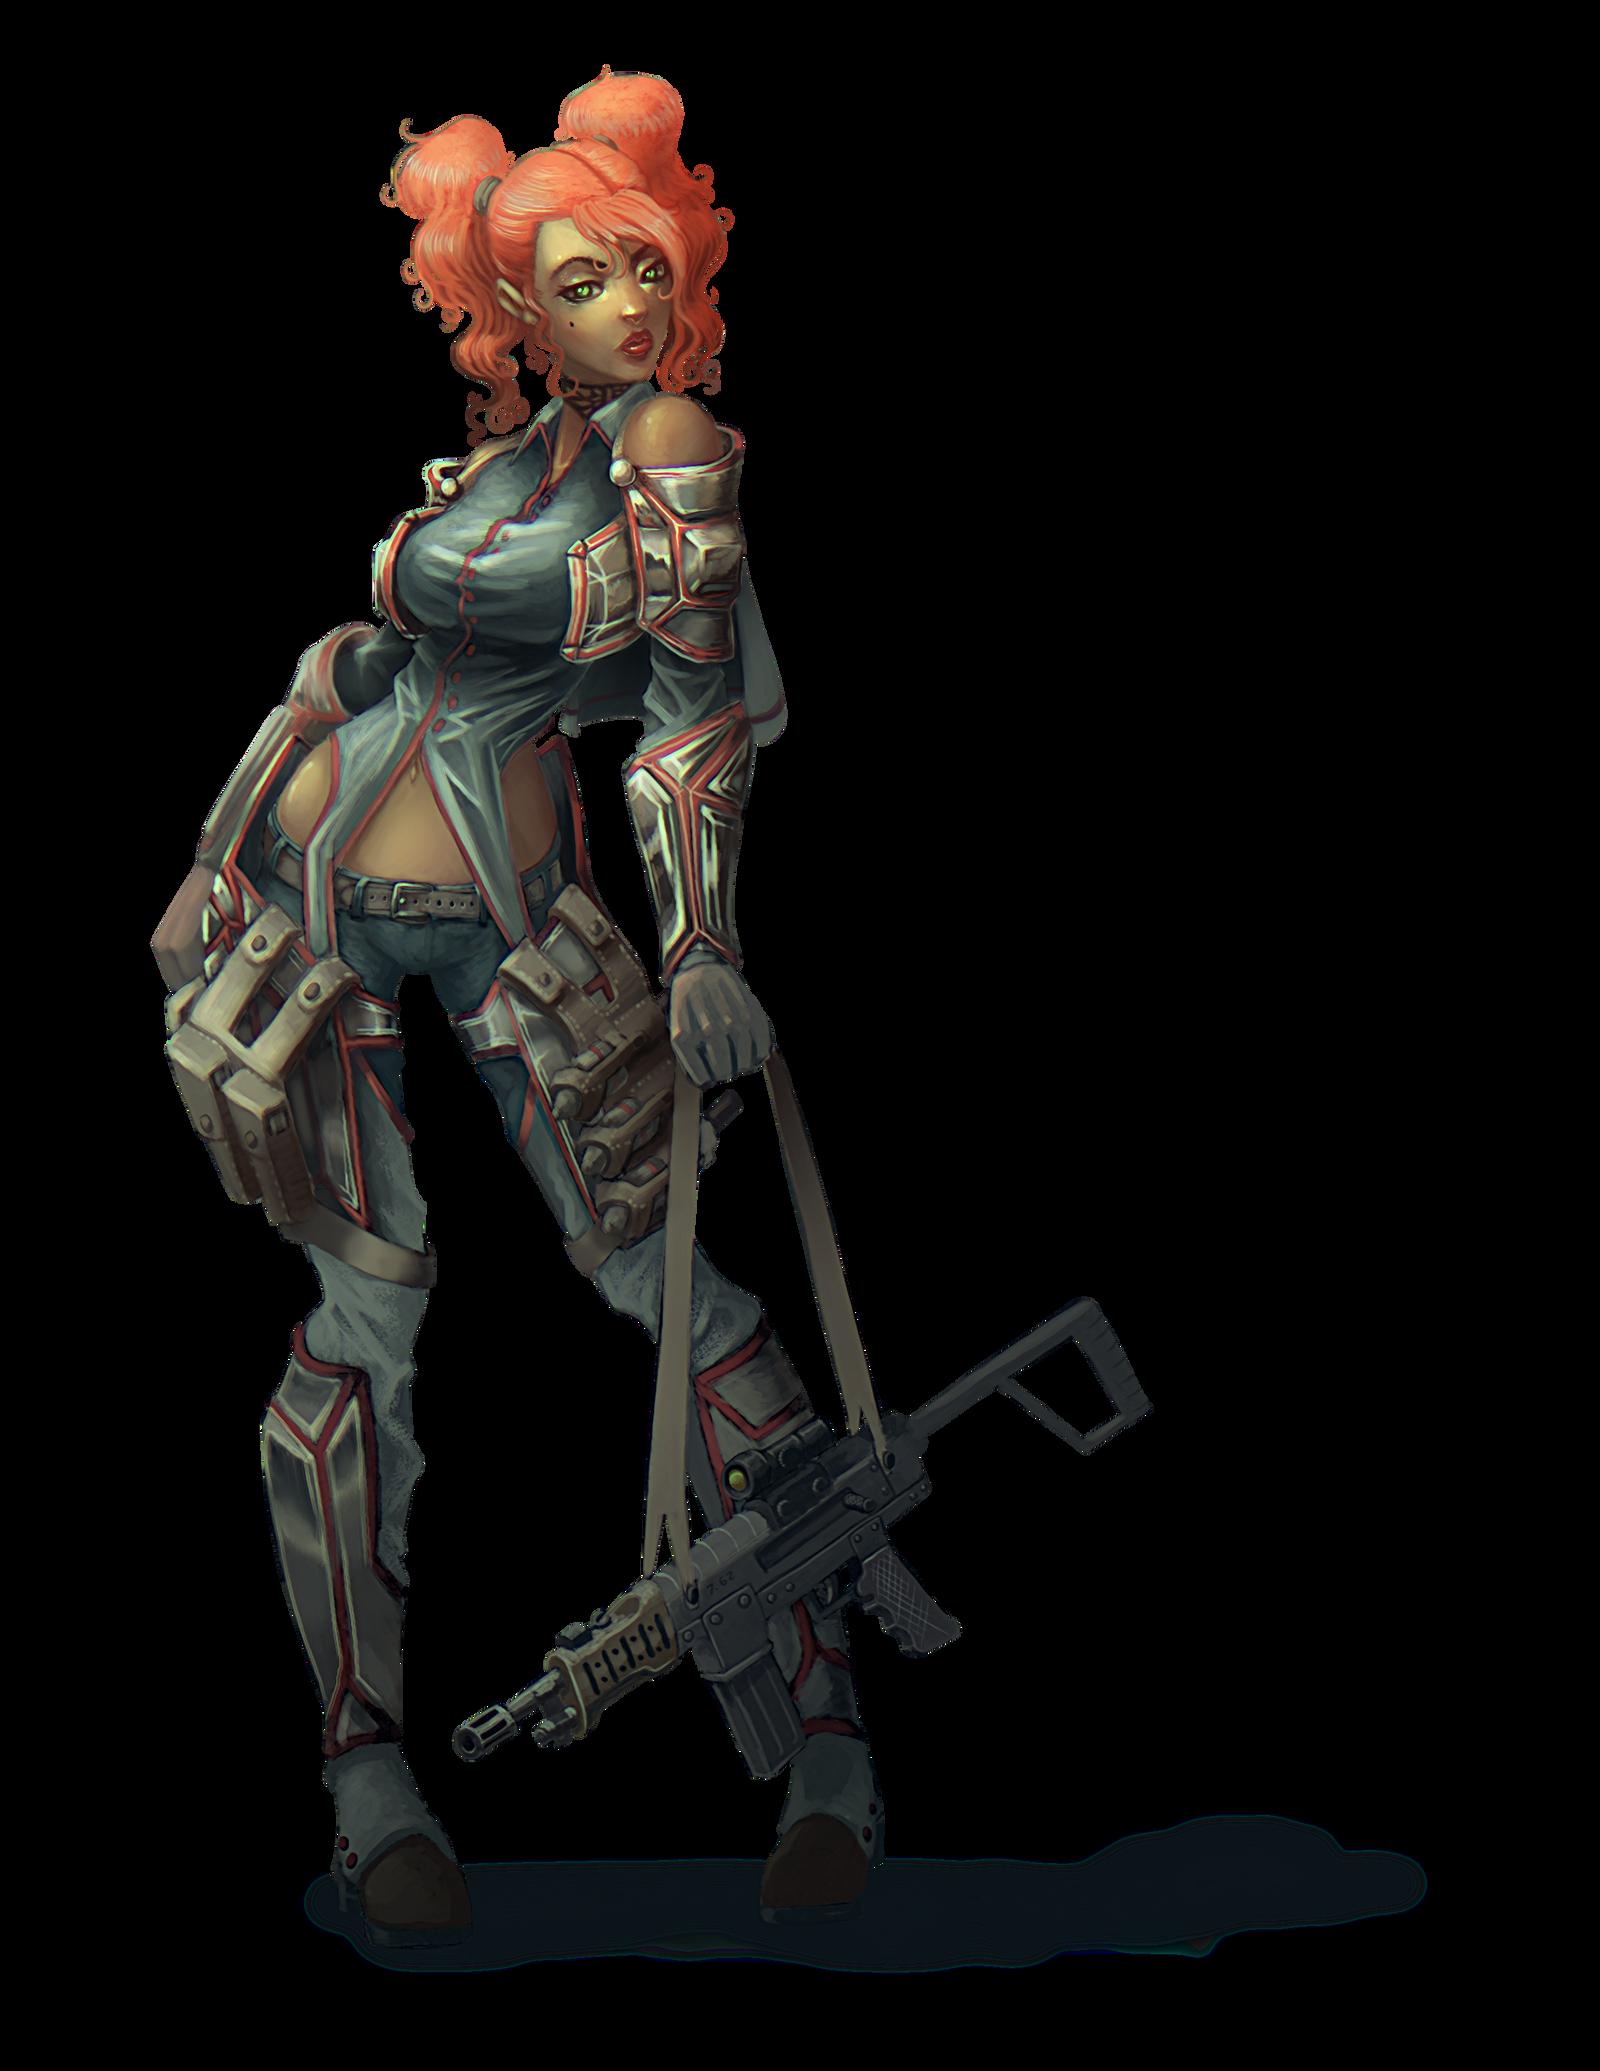 Valkyria Chronicles Fan art Rosie by BlackHawk45LC